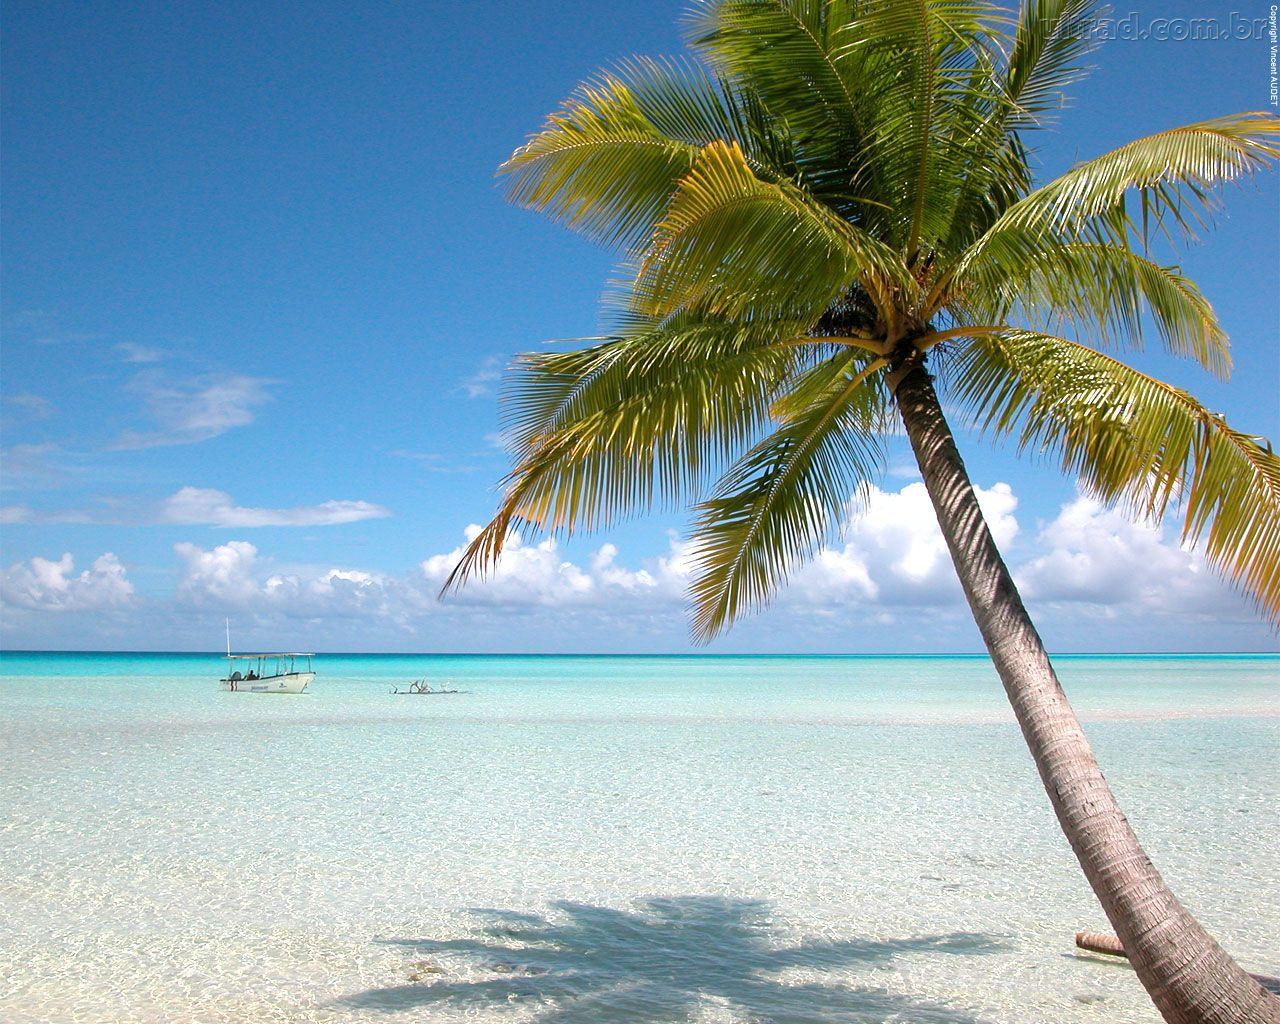 refletindo na praia papel - photo #13